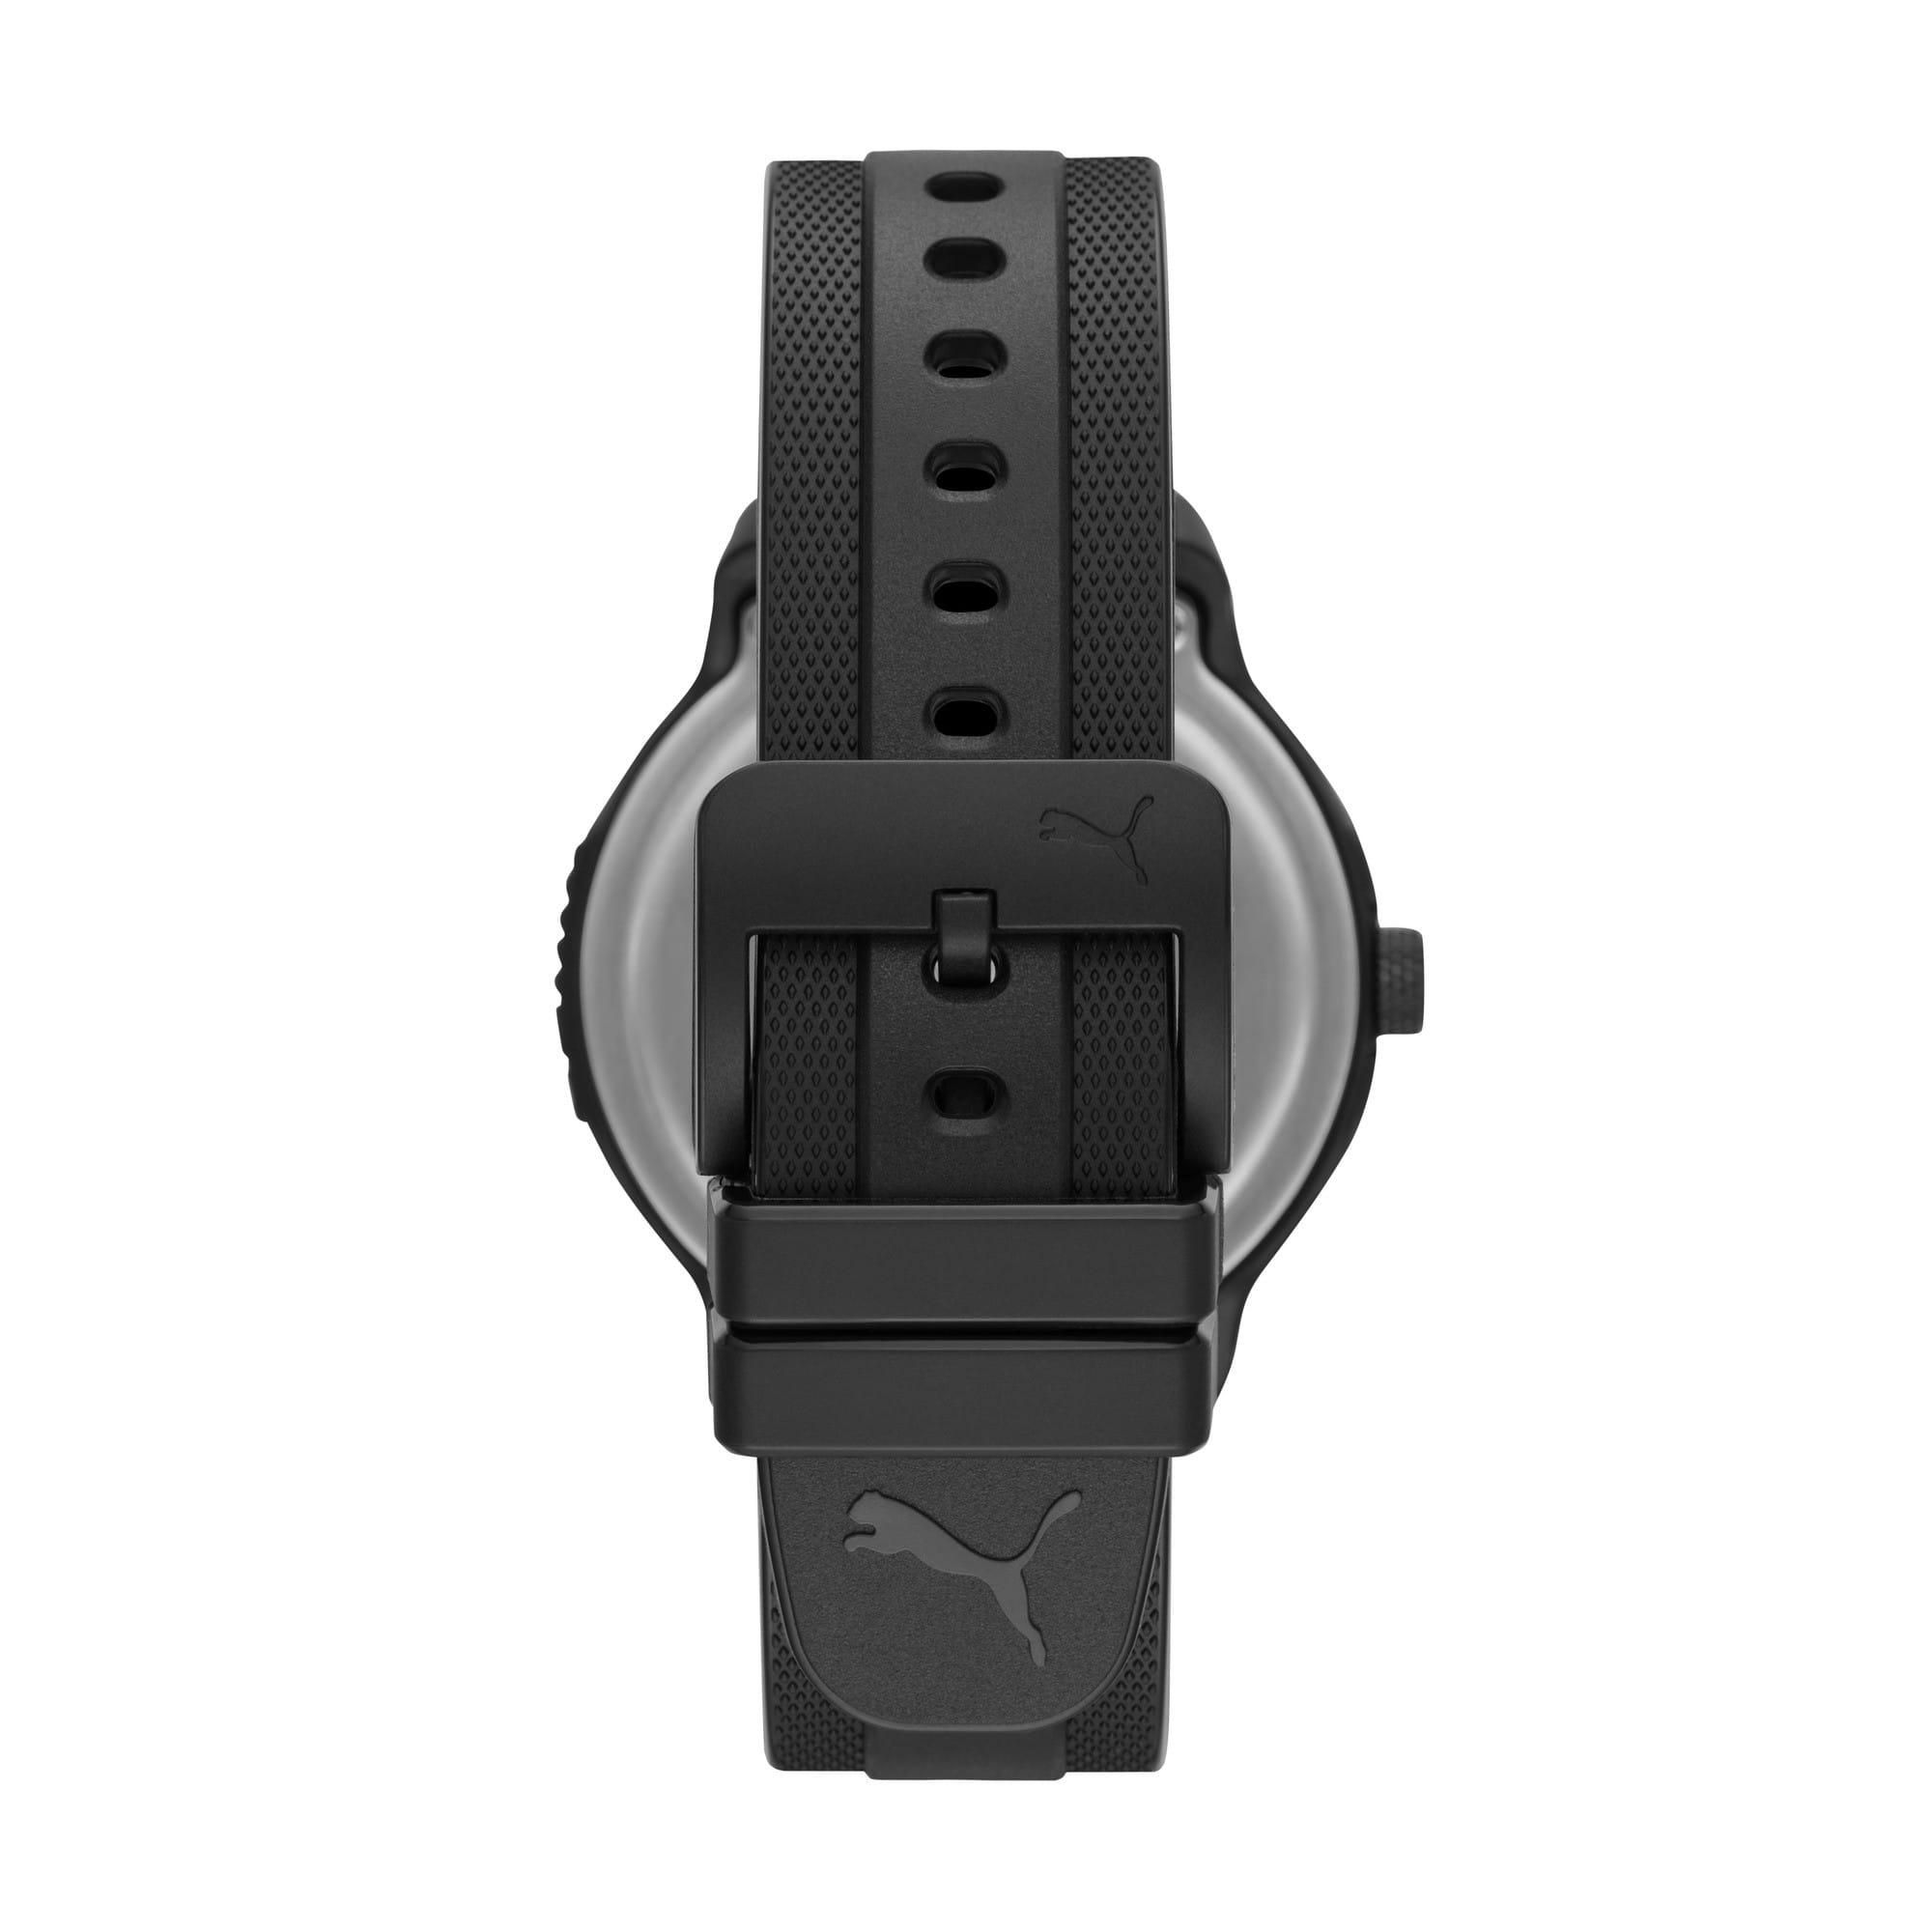 Thumbnail 2 of Reset v2 Watch, Black/Black, medium